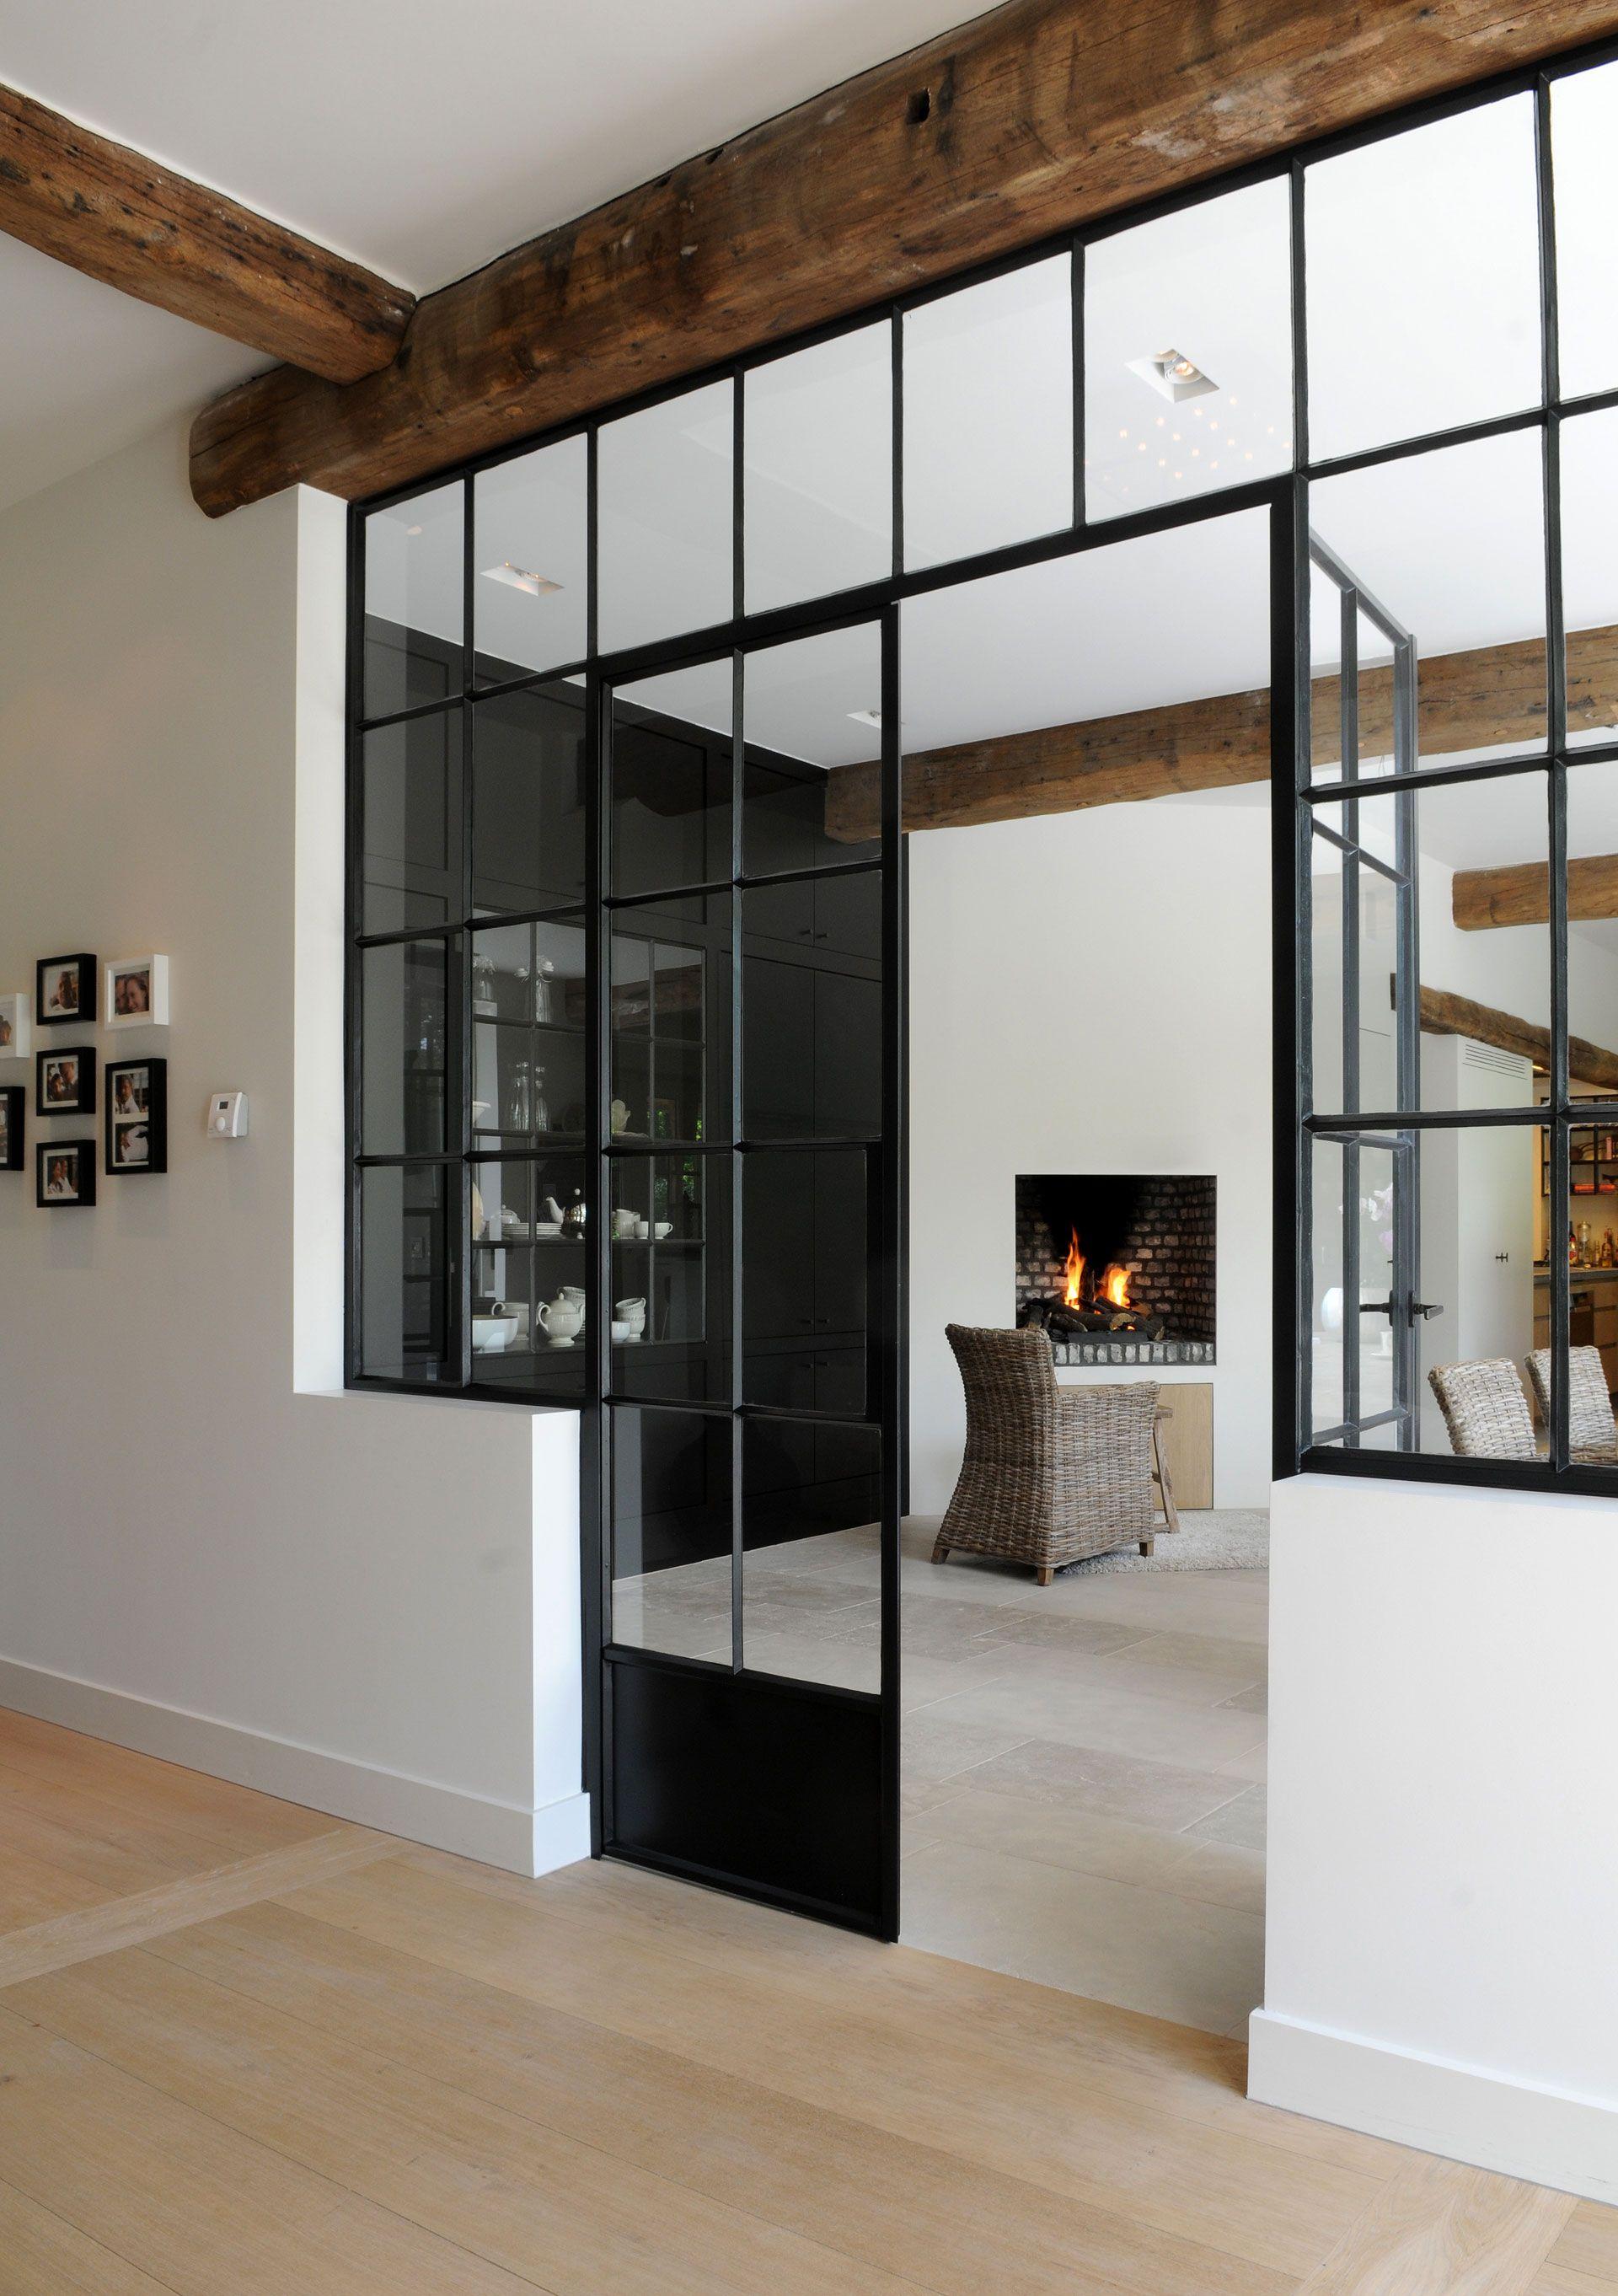 Barn window decor  hot rolled steel doors and barn beams  small hillside home ideas